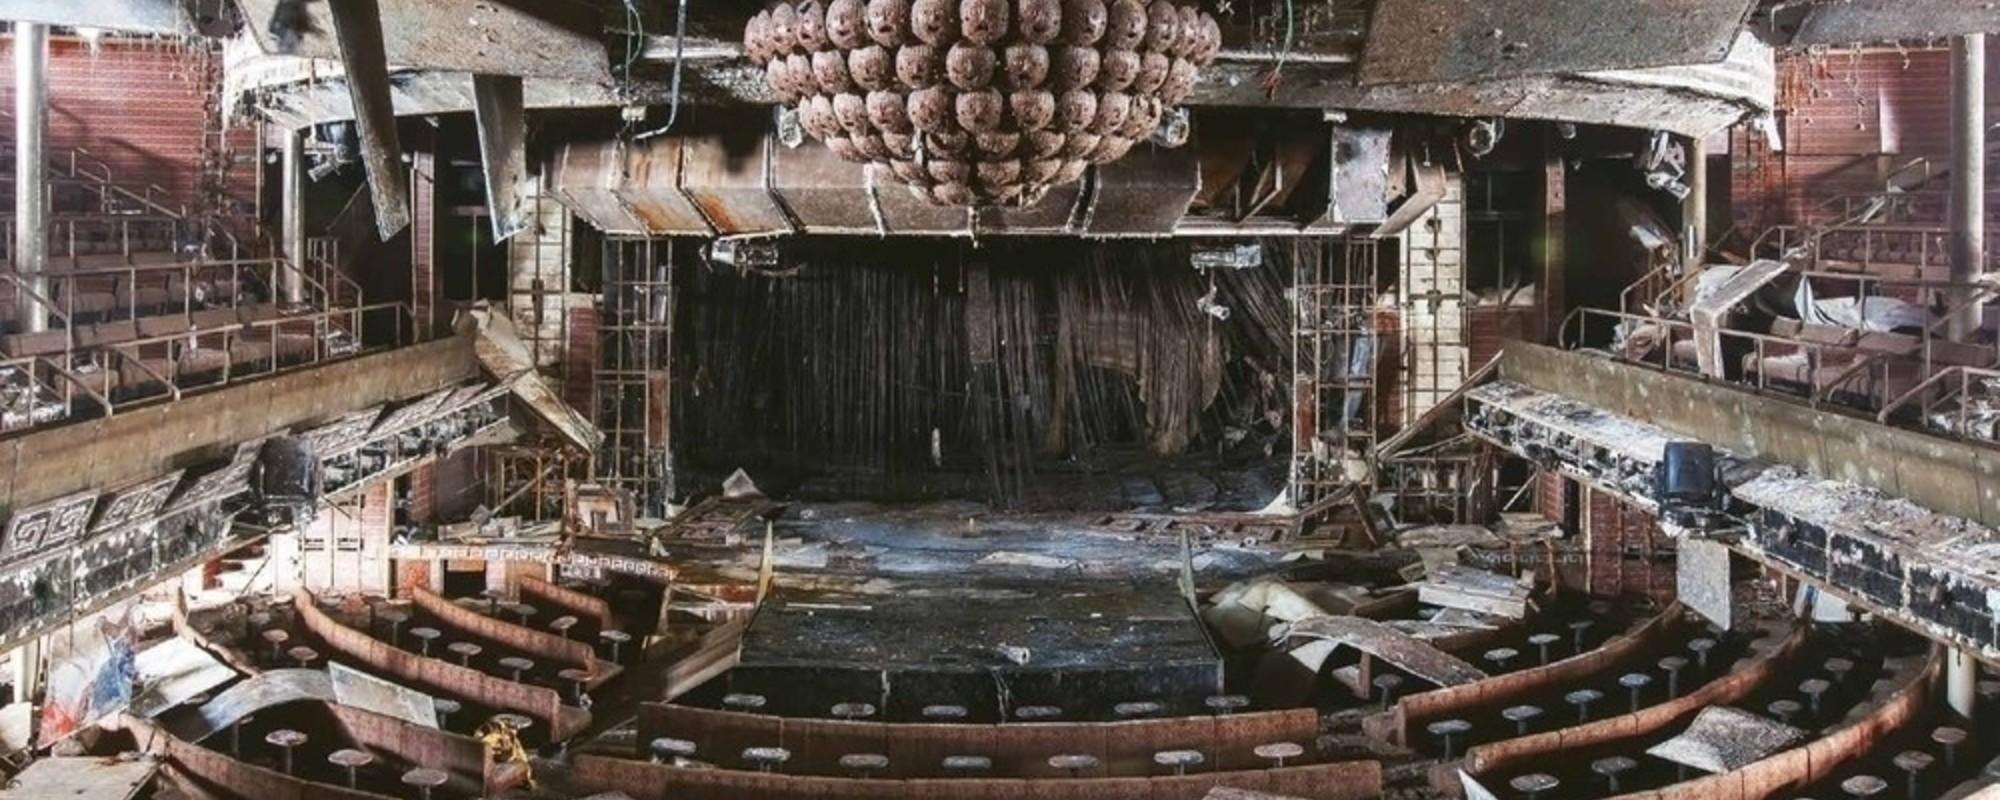 Fotografii din epava unui vas de lux naufragiat